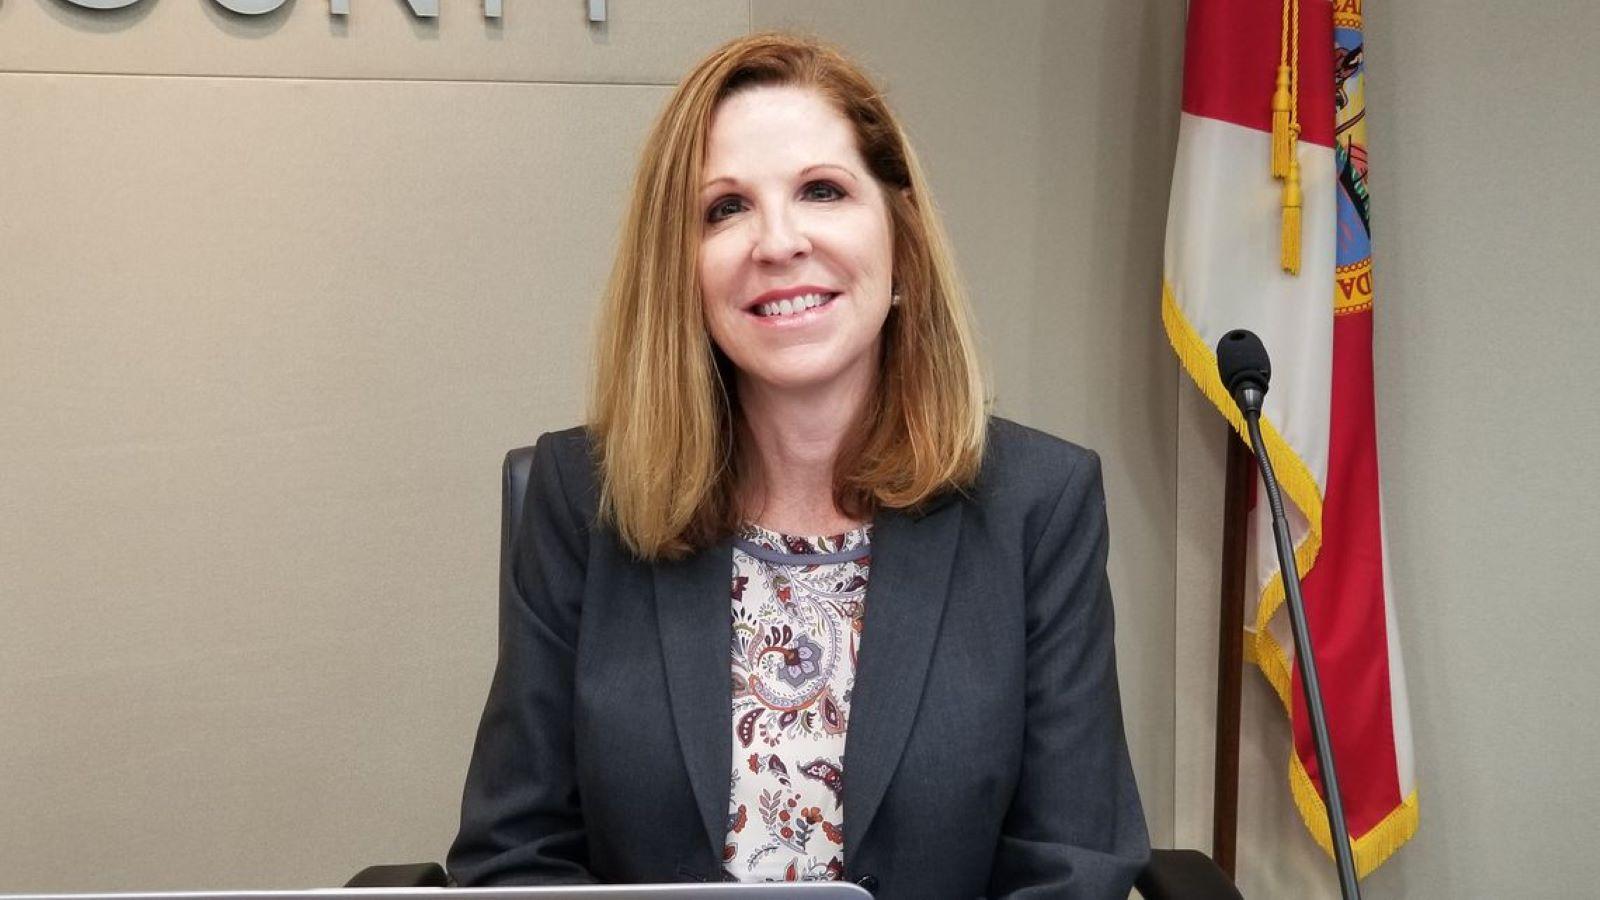 Pasco School Board Member Colleen Beaudoin